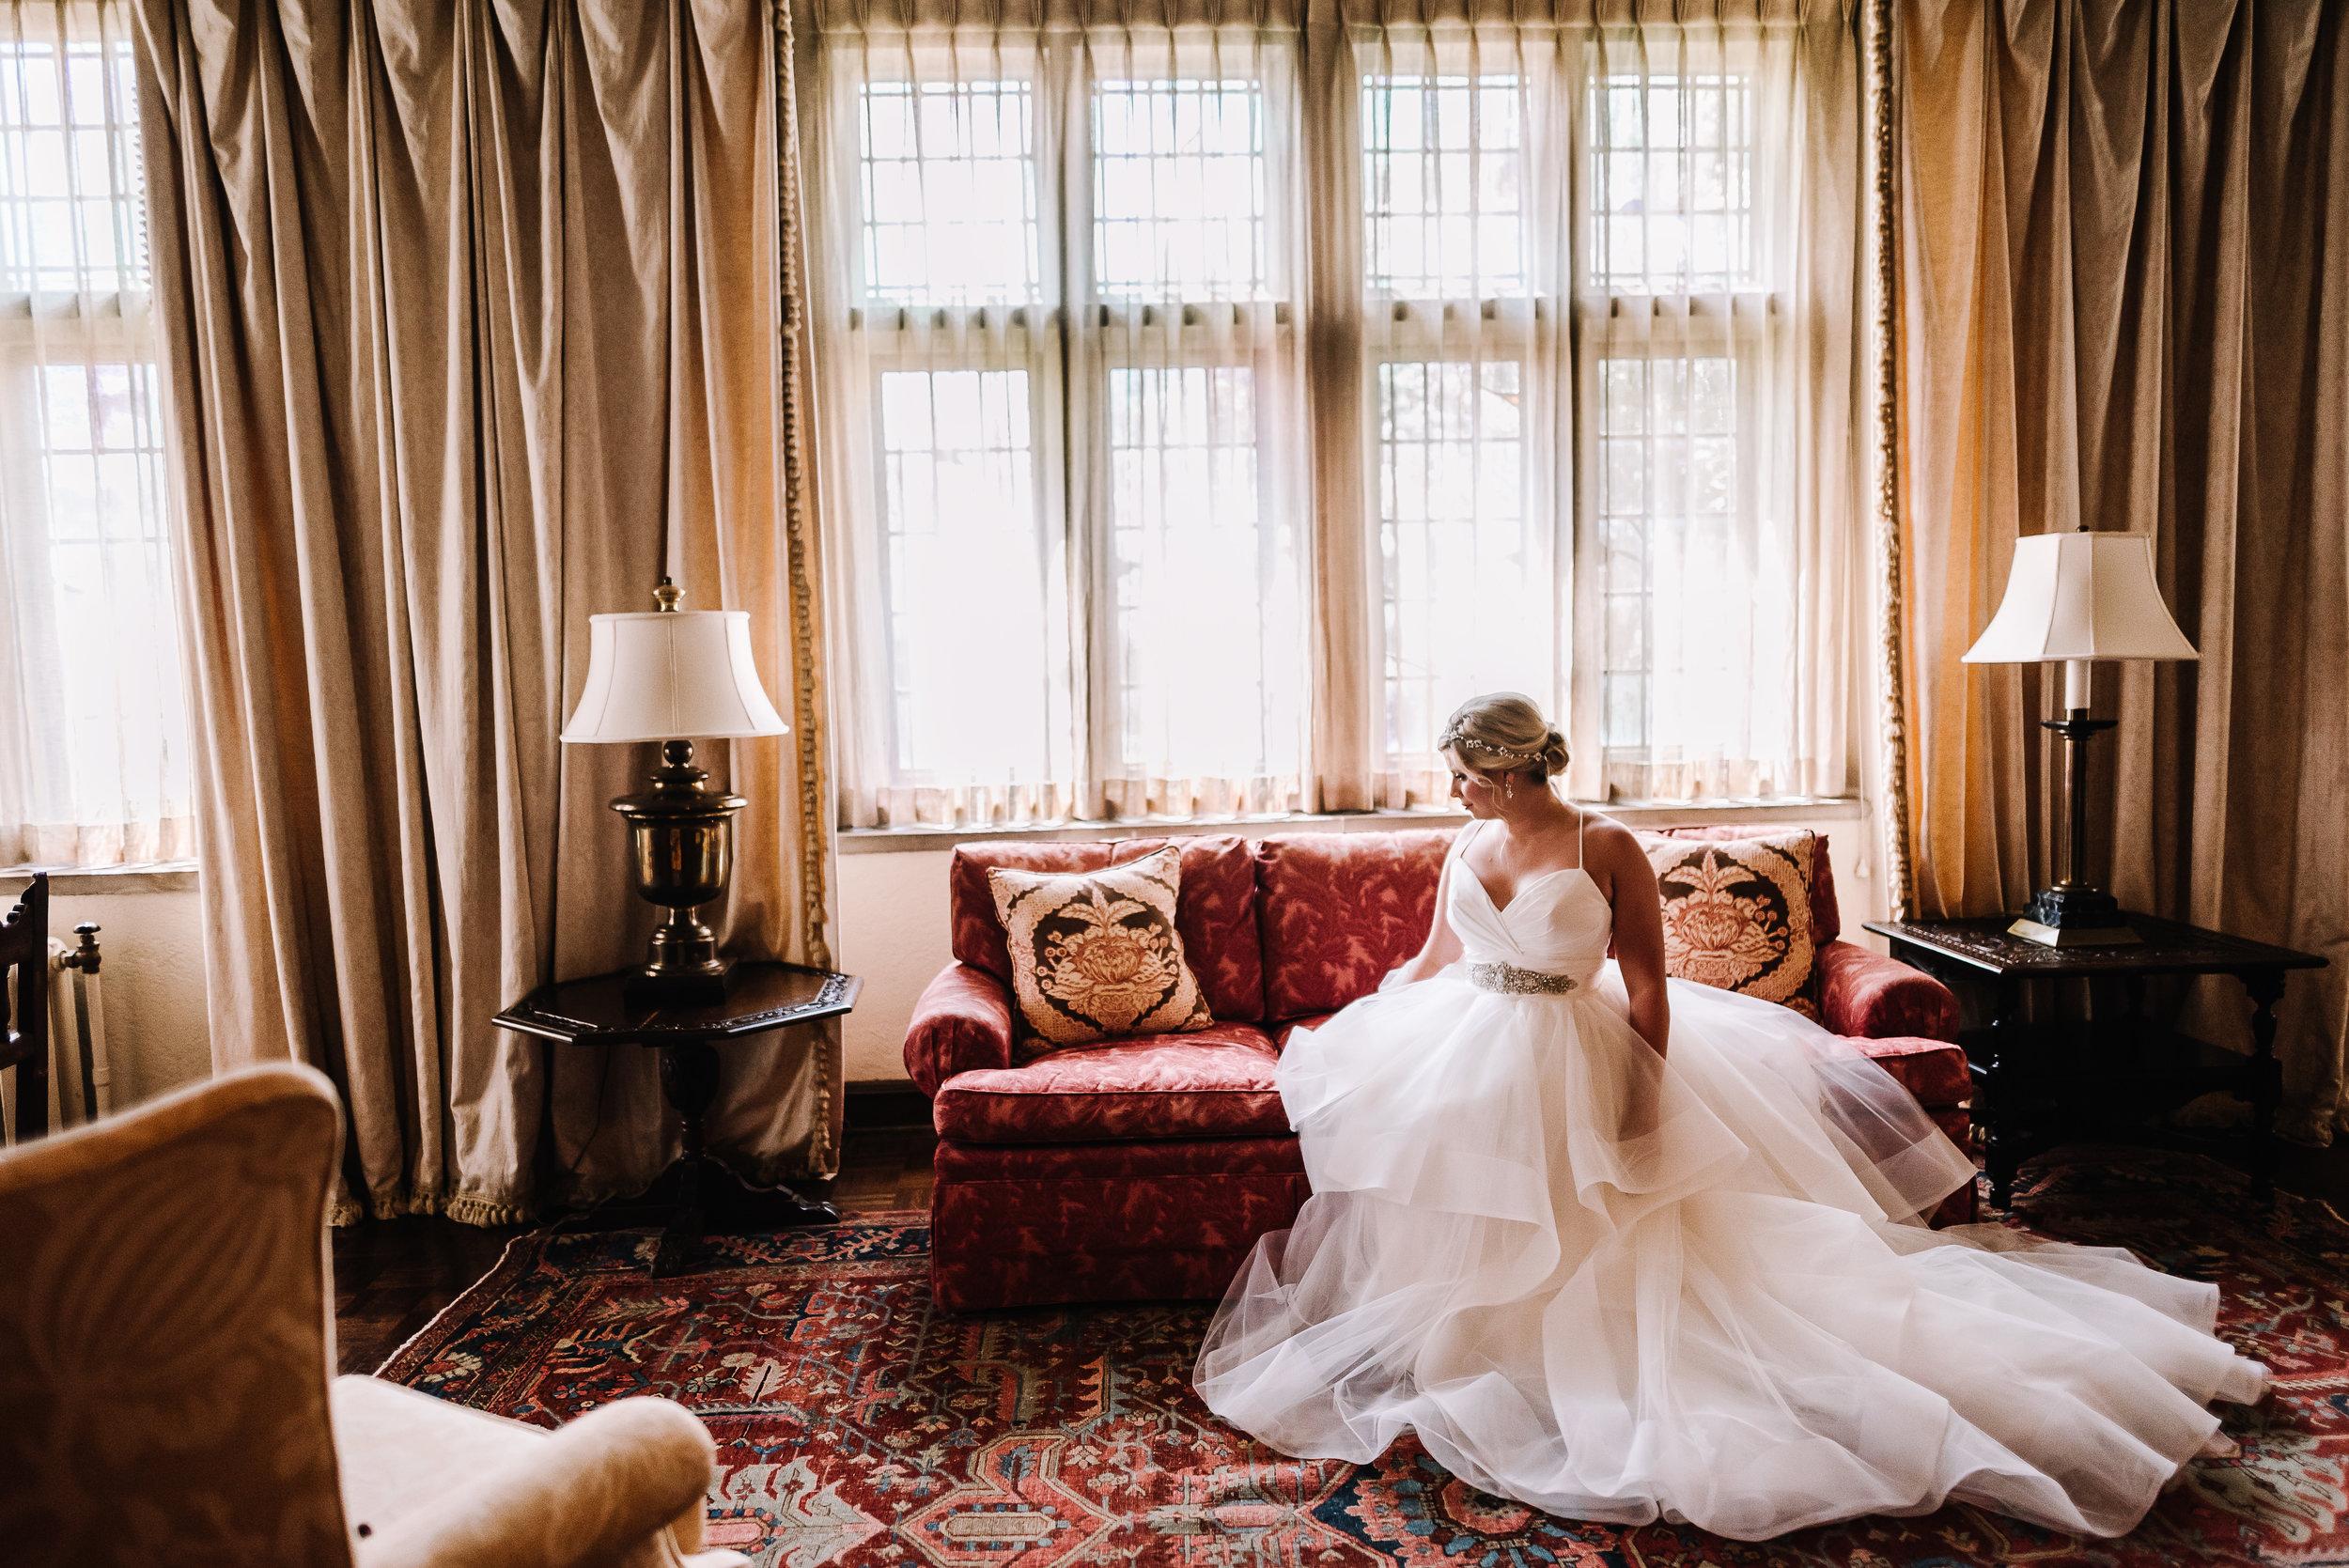 Idlewild_Church_Myers_Wedding_Ashley-Benham-Photography-11.jpg